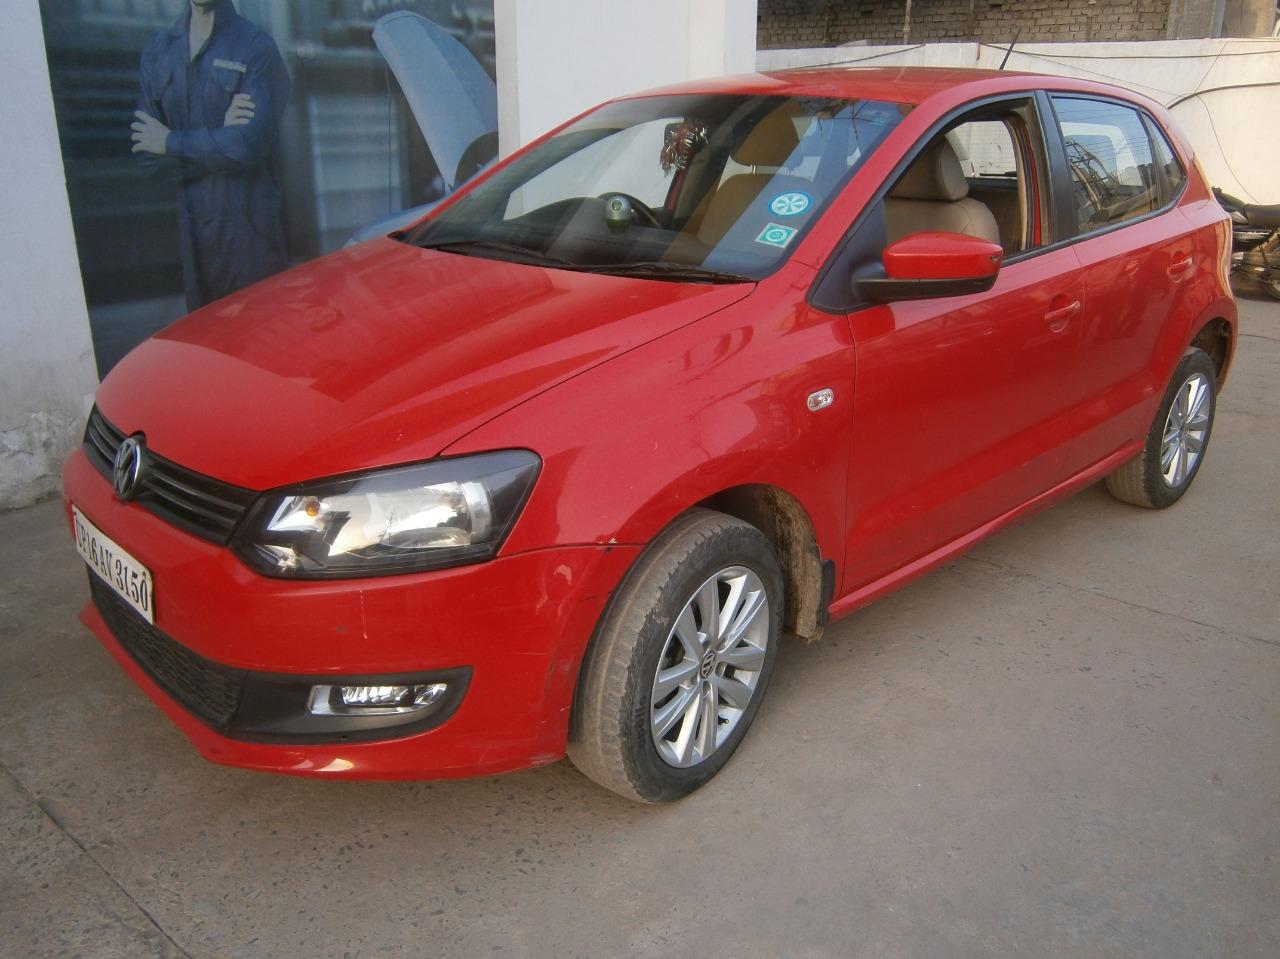 2014 Used Volkswagen Polo COMFORTLINE 1.2L PETROL